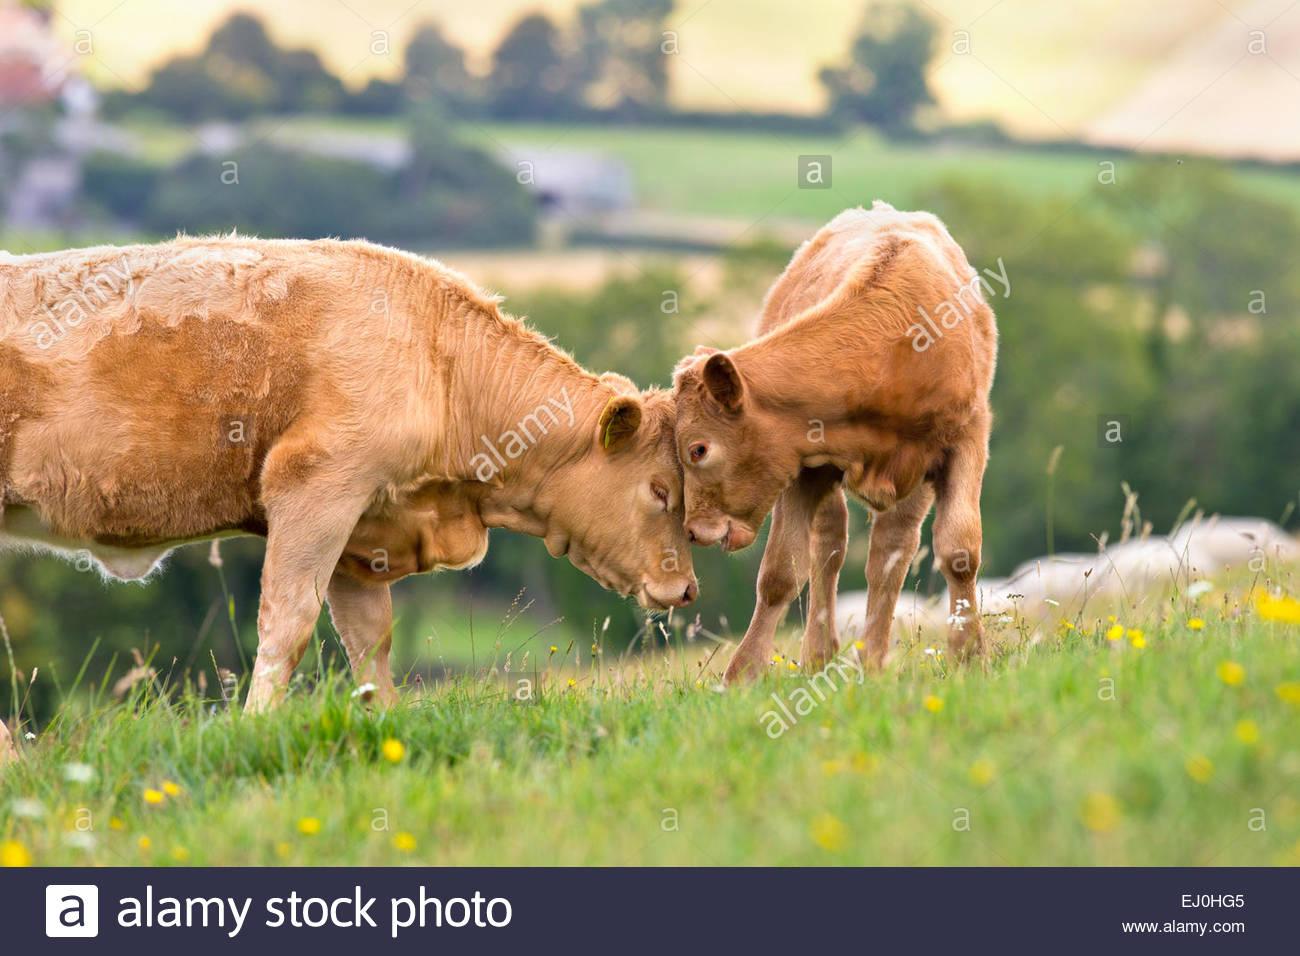 Vache et son veau Devon in rural field Photo Stock